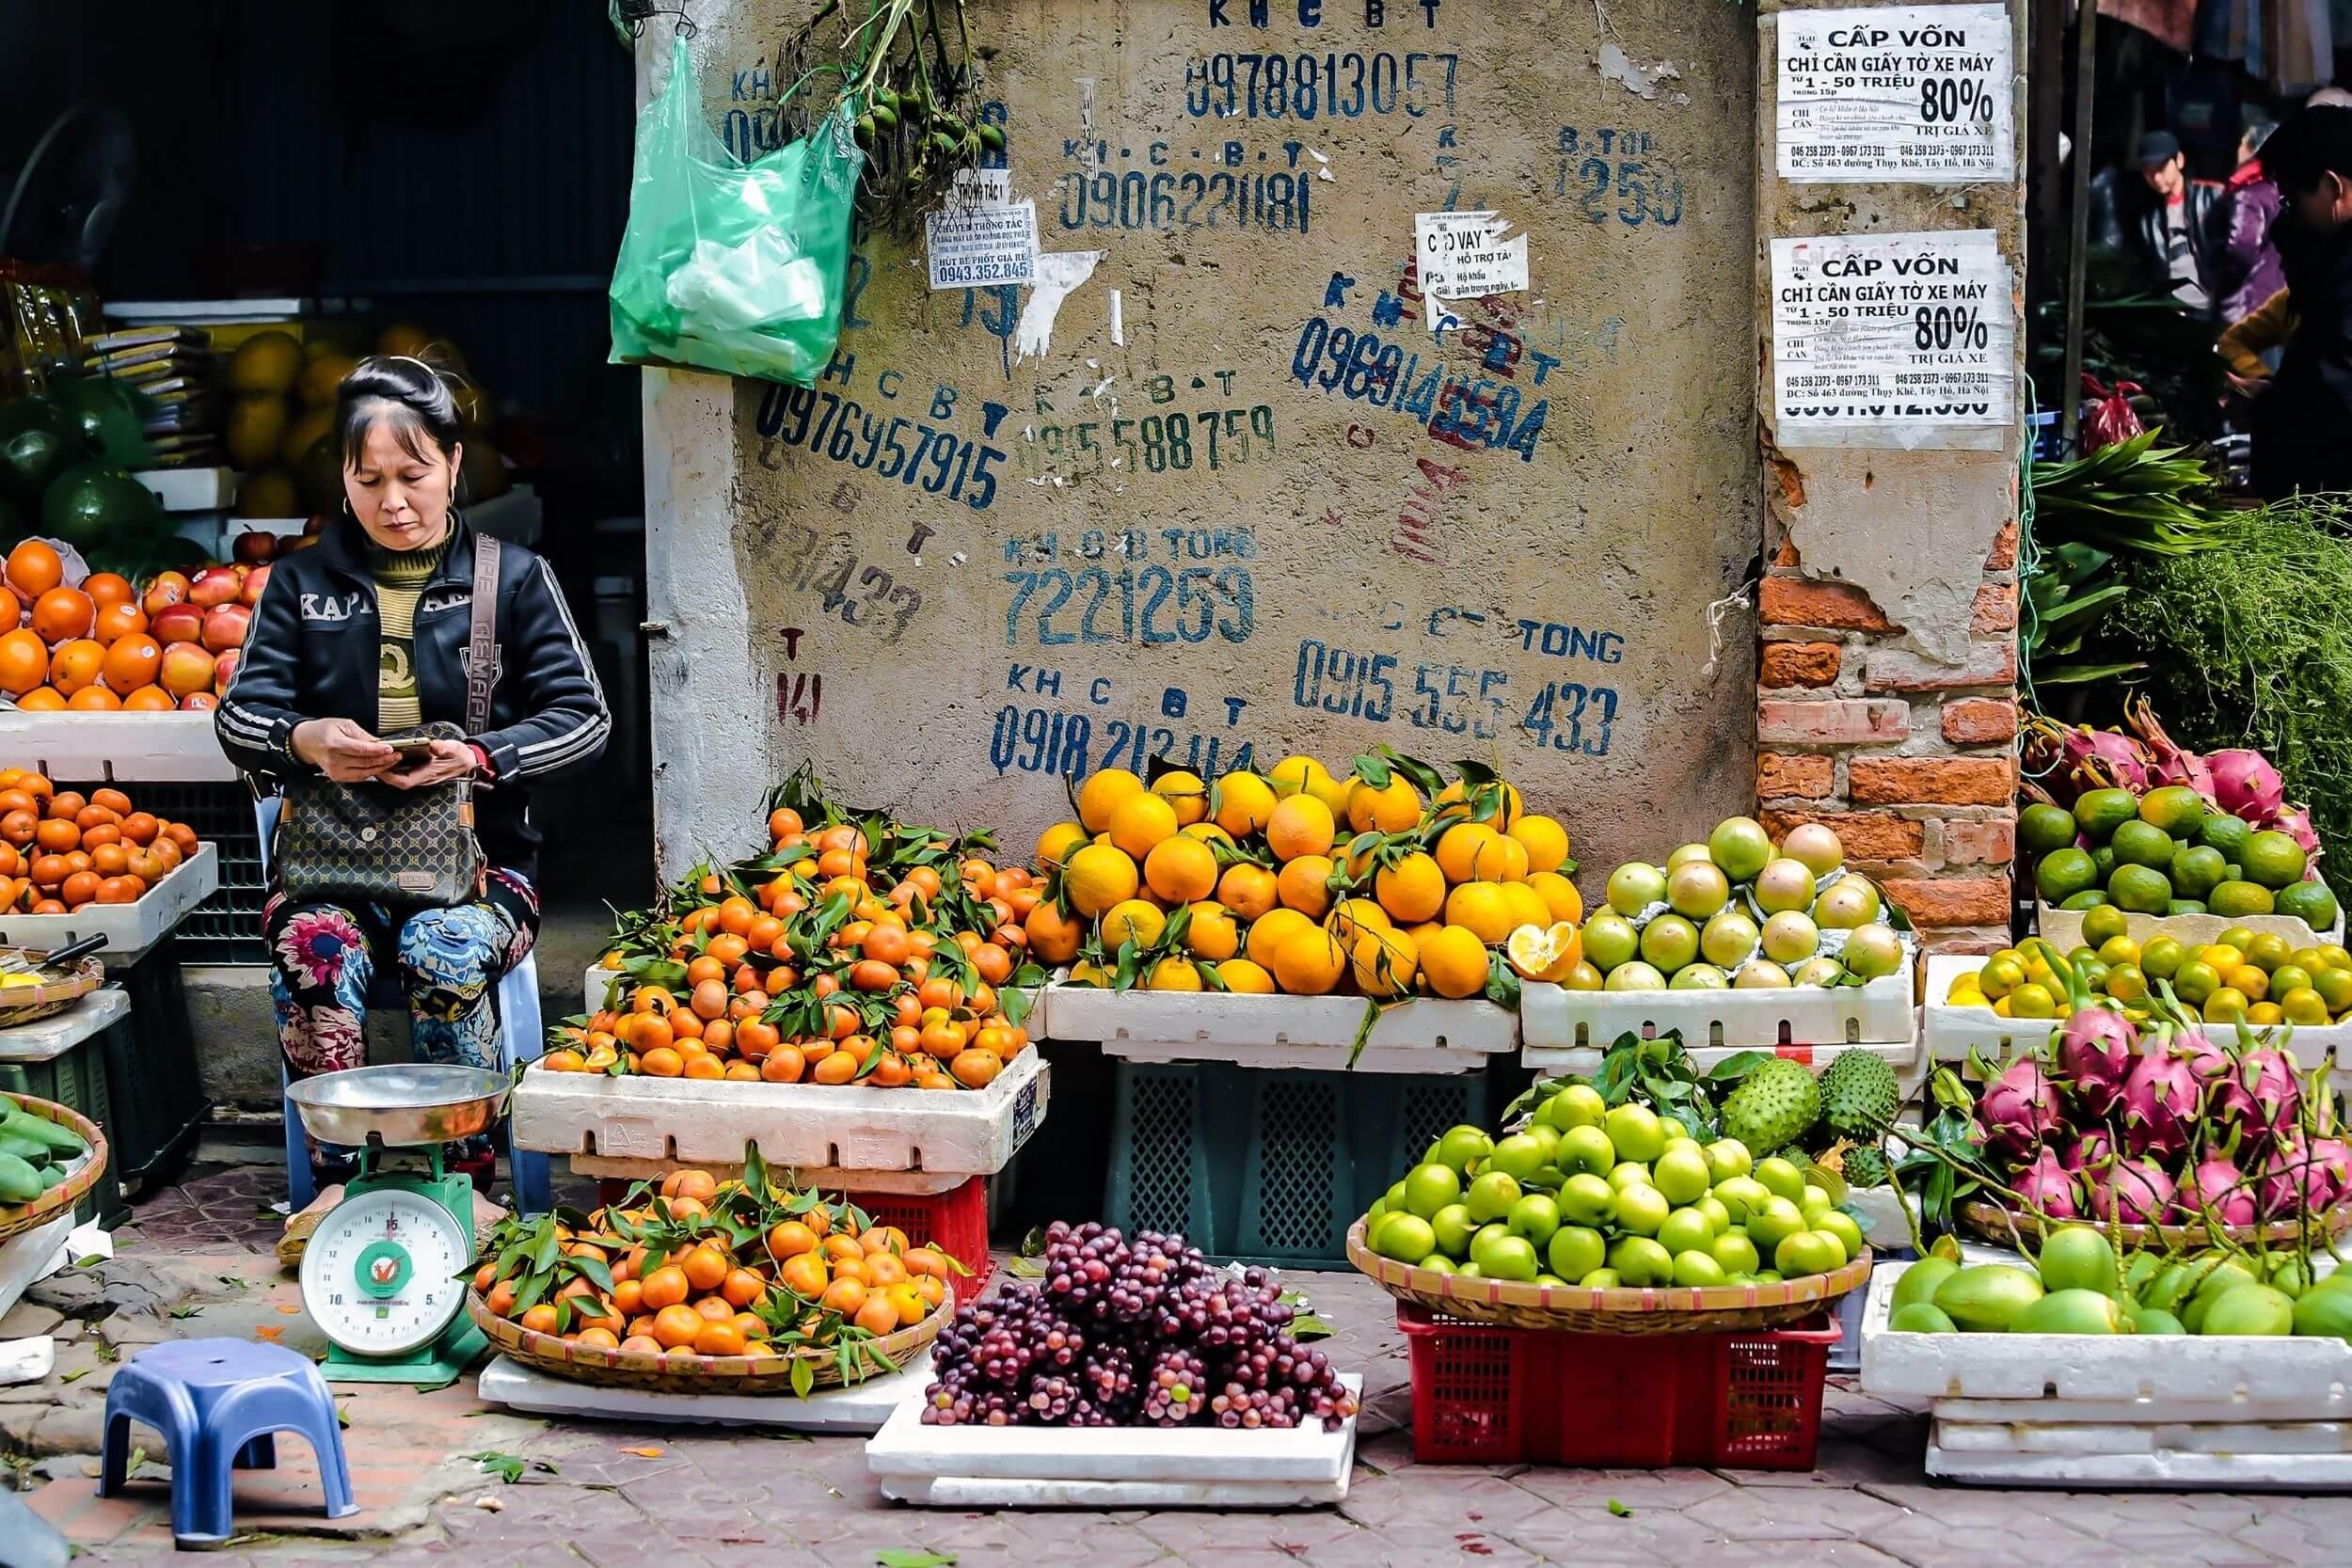 Food market in Hanoi